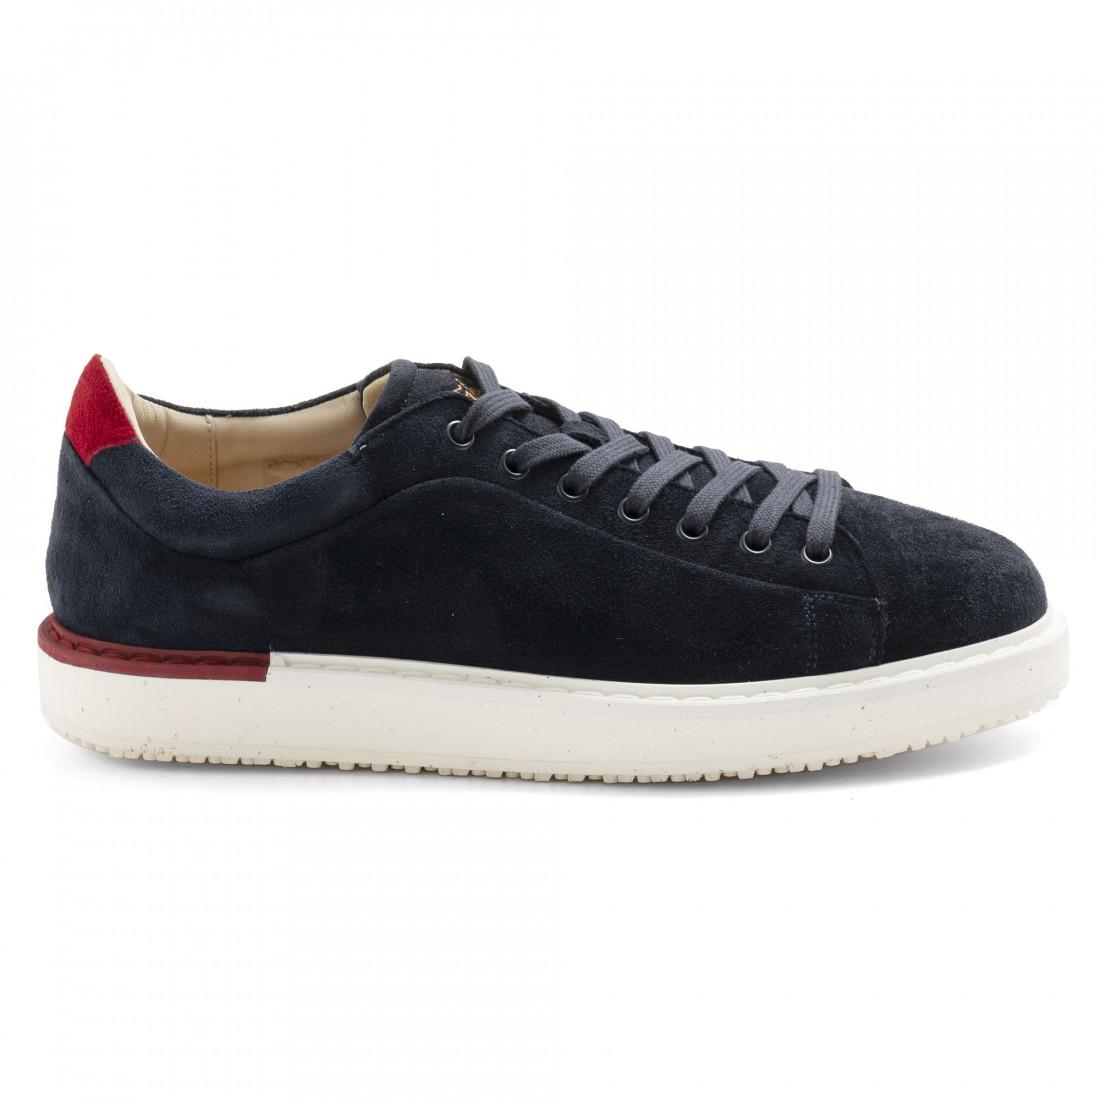 sneakers herren fabi fu9326b04wimcrog76 6804